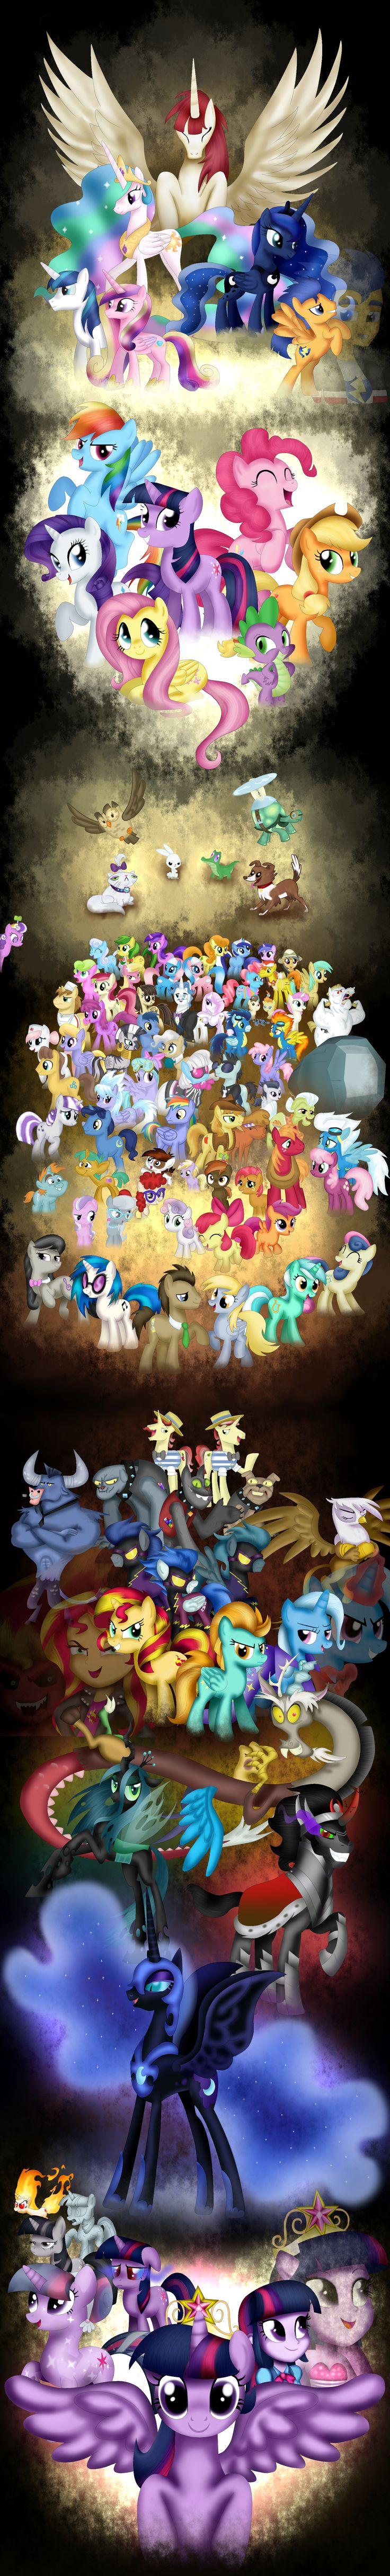 My+Little+Pony:+Friendship+is+Magic+by+Rux--Xan.deviantart.com+on+@deviantART